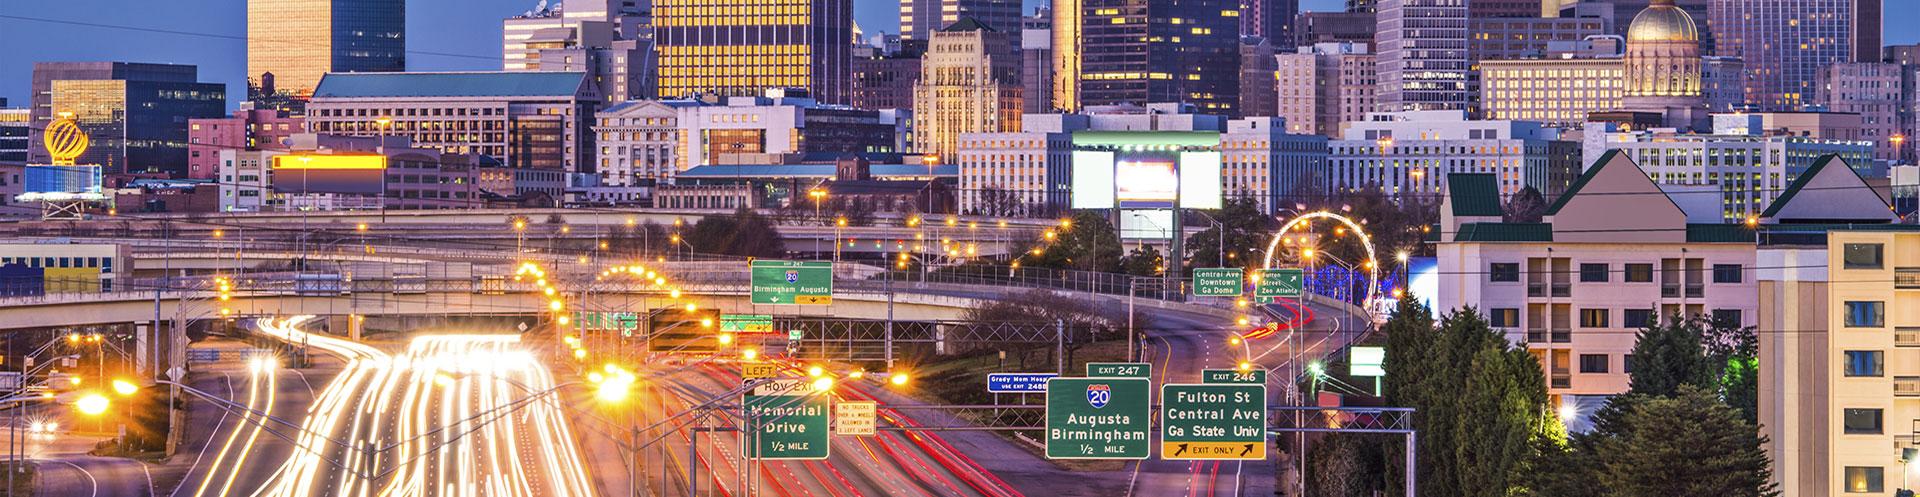 Kennesaw State University >> Kennesaw State University Georgia Pavement And Traffic